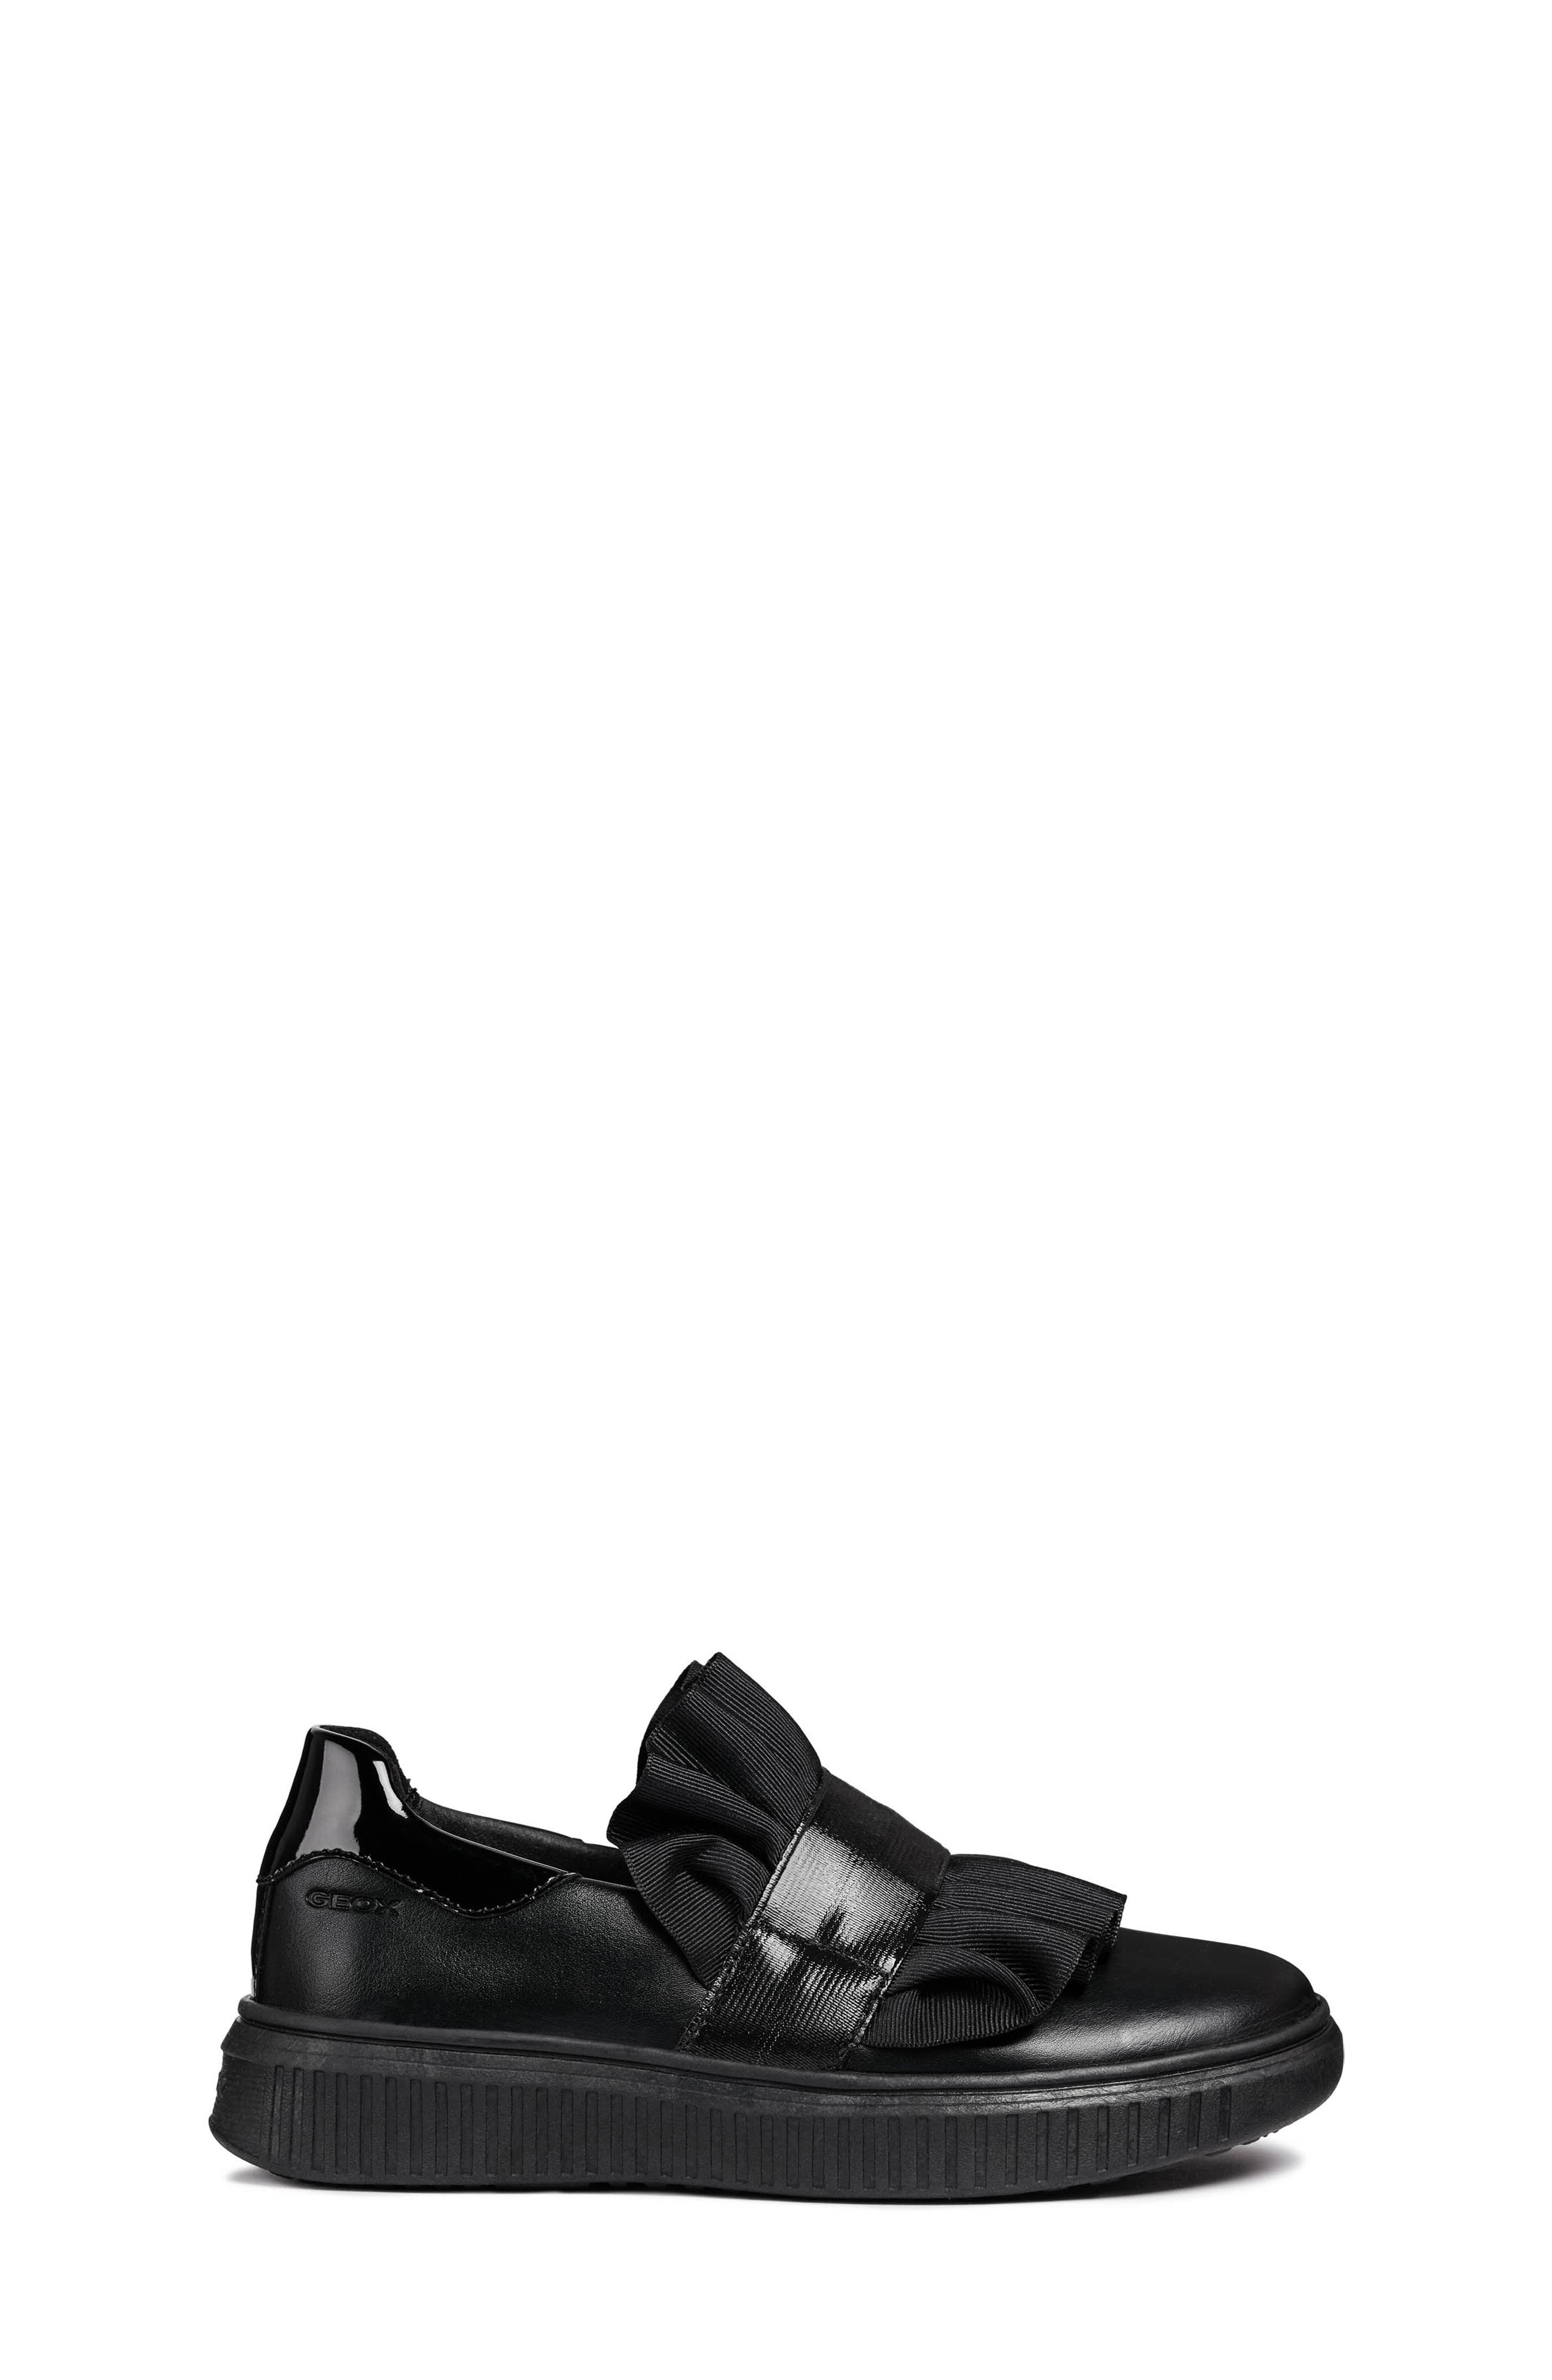 Disco Mix Slip-On Sneaker,                             Alternate thumbnail 6, color,                             BLACK